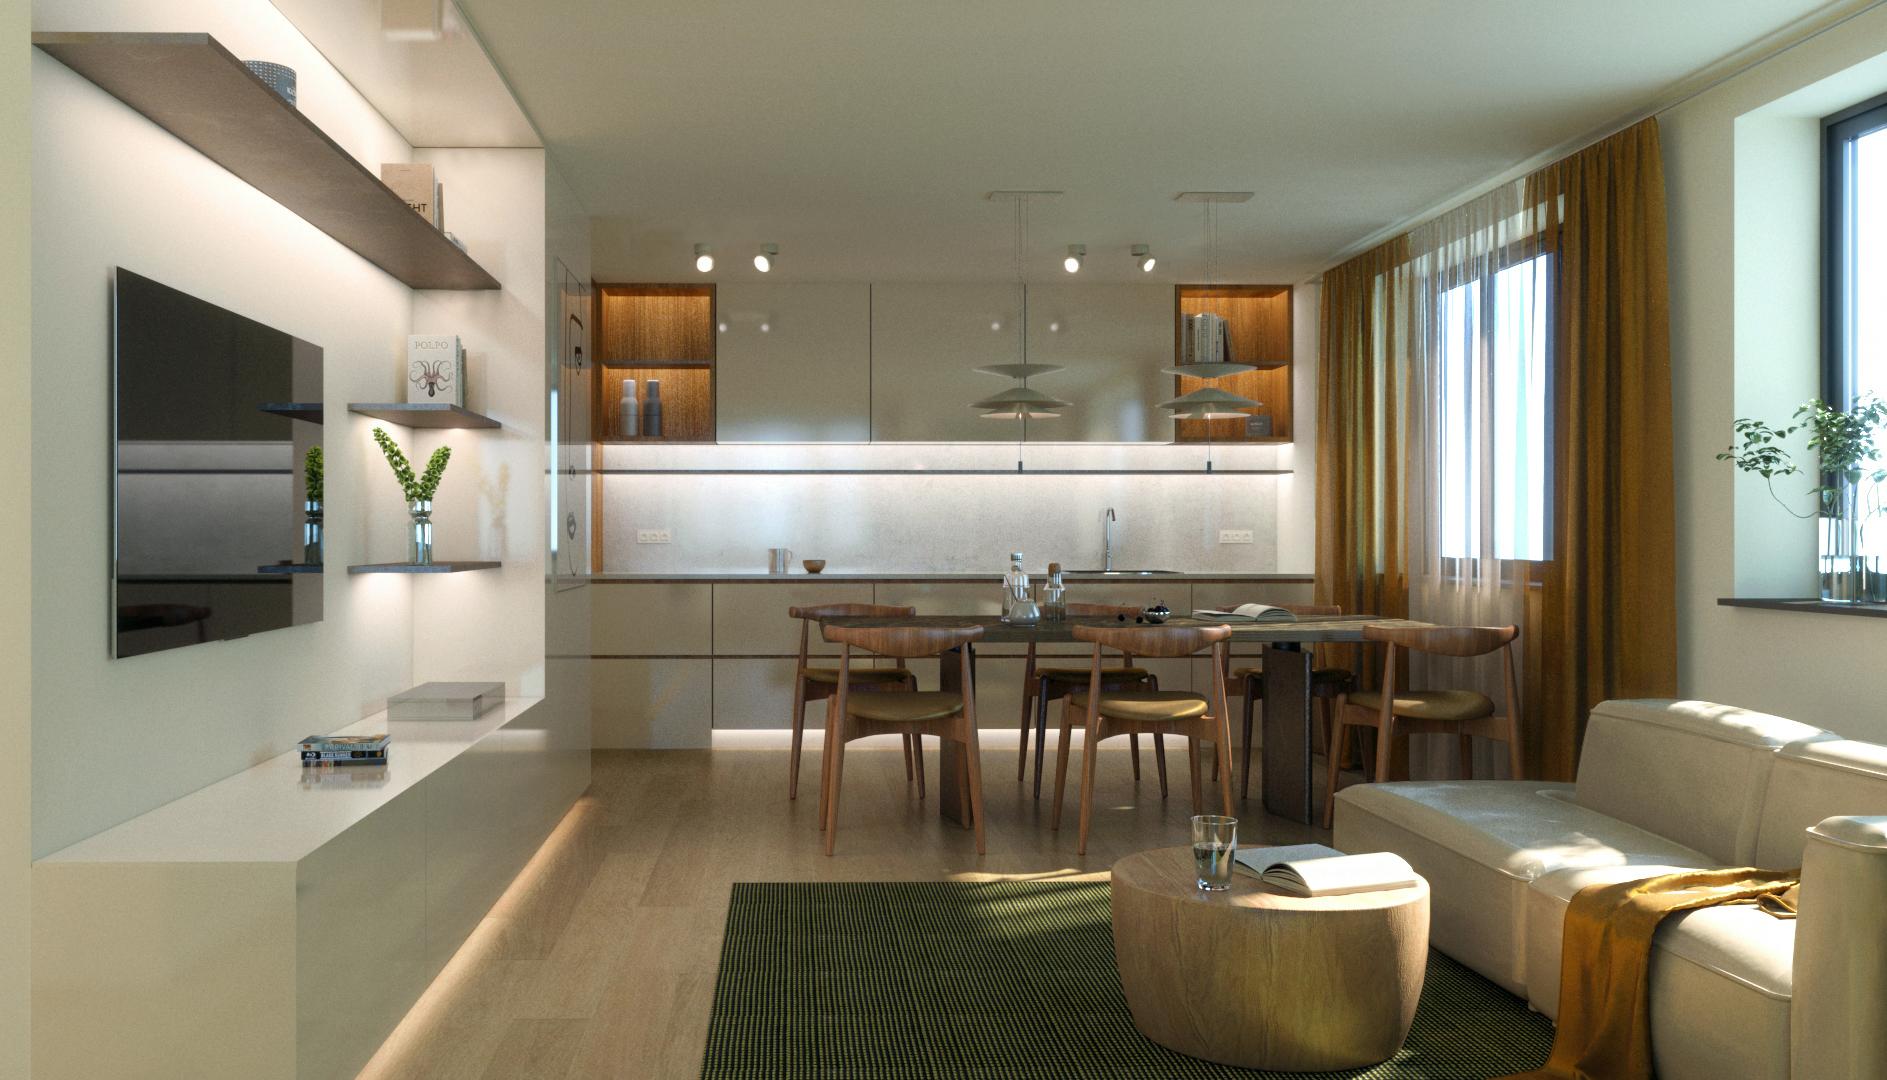 London_Apartment_Gila_Shemie_Zakay_Bre (2).jpg